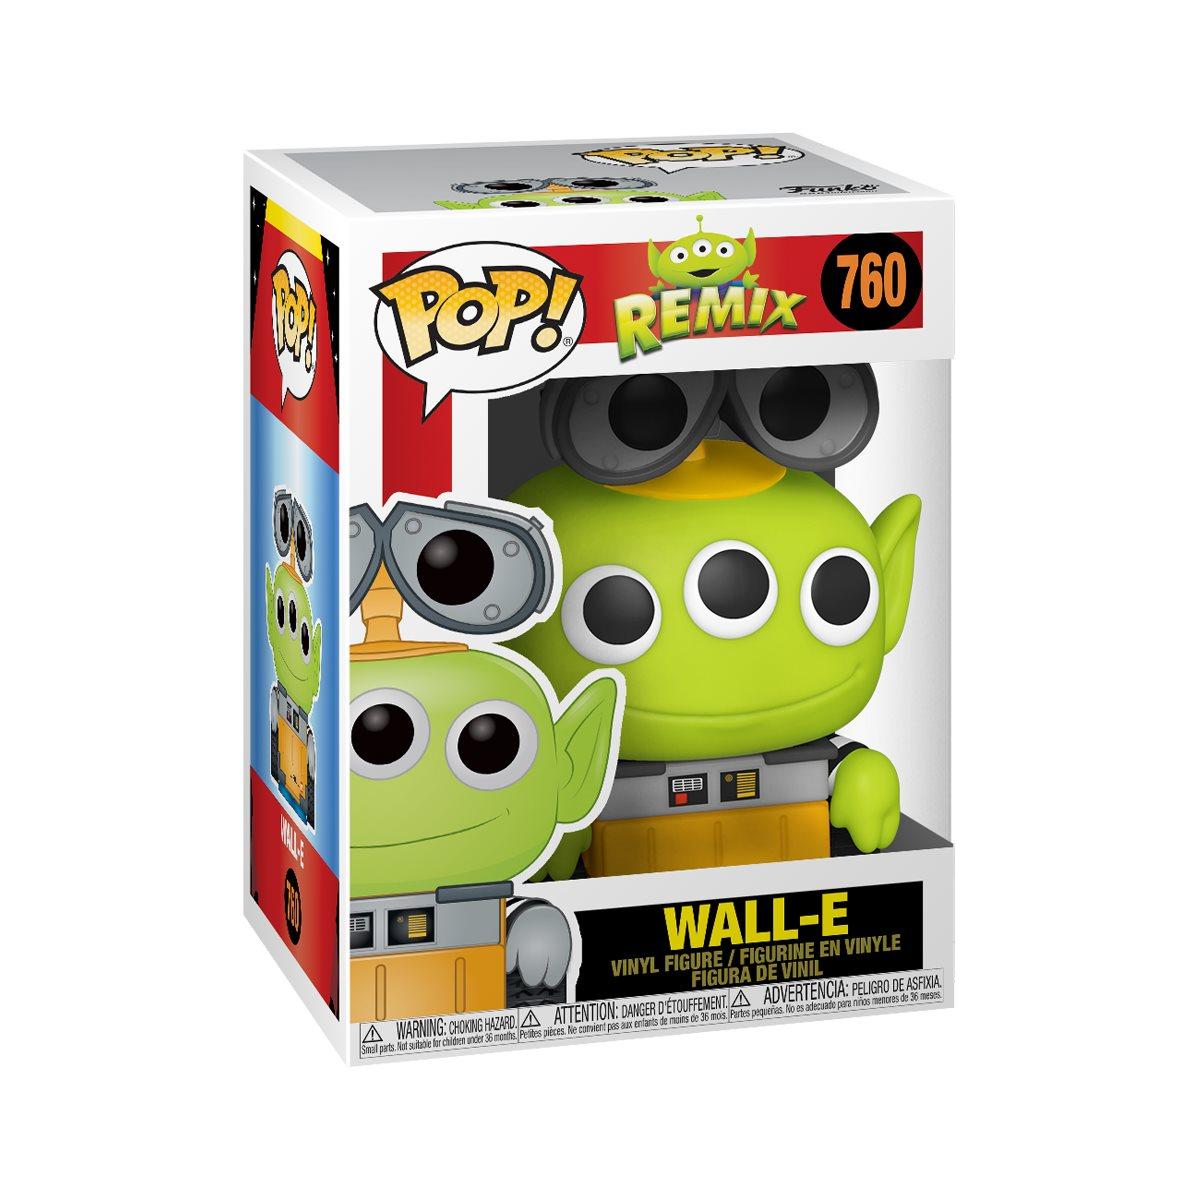 Funko Pop! Disney: Pixar Alien Remix - Alien as Wall-E #760 - Funko